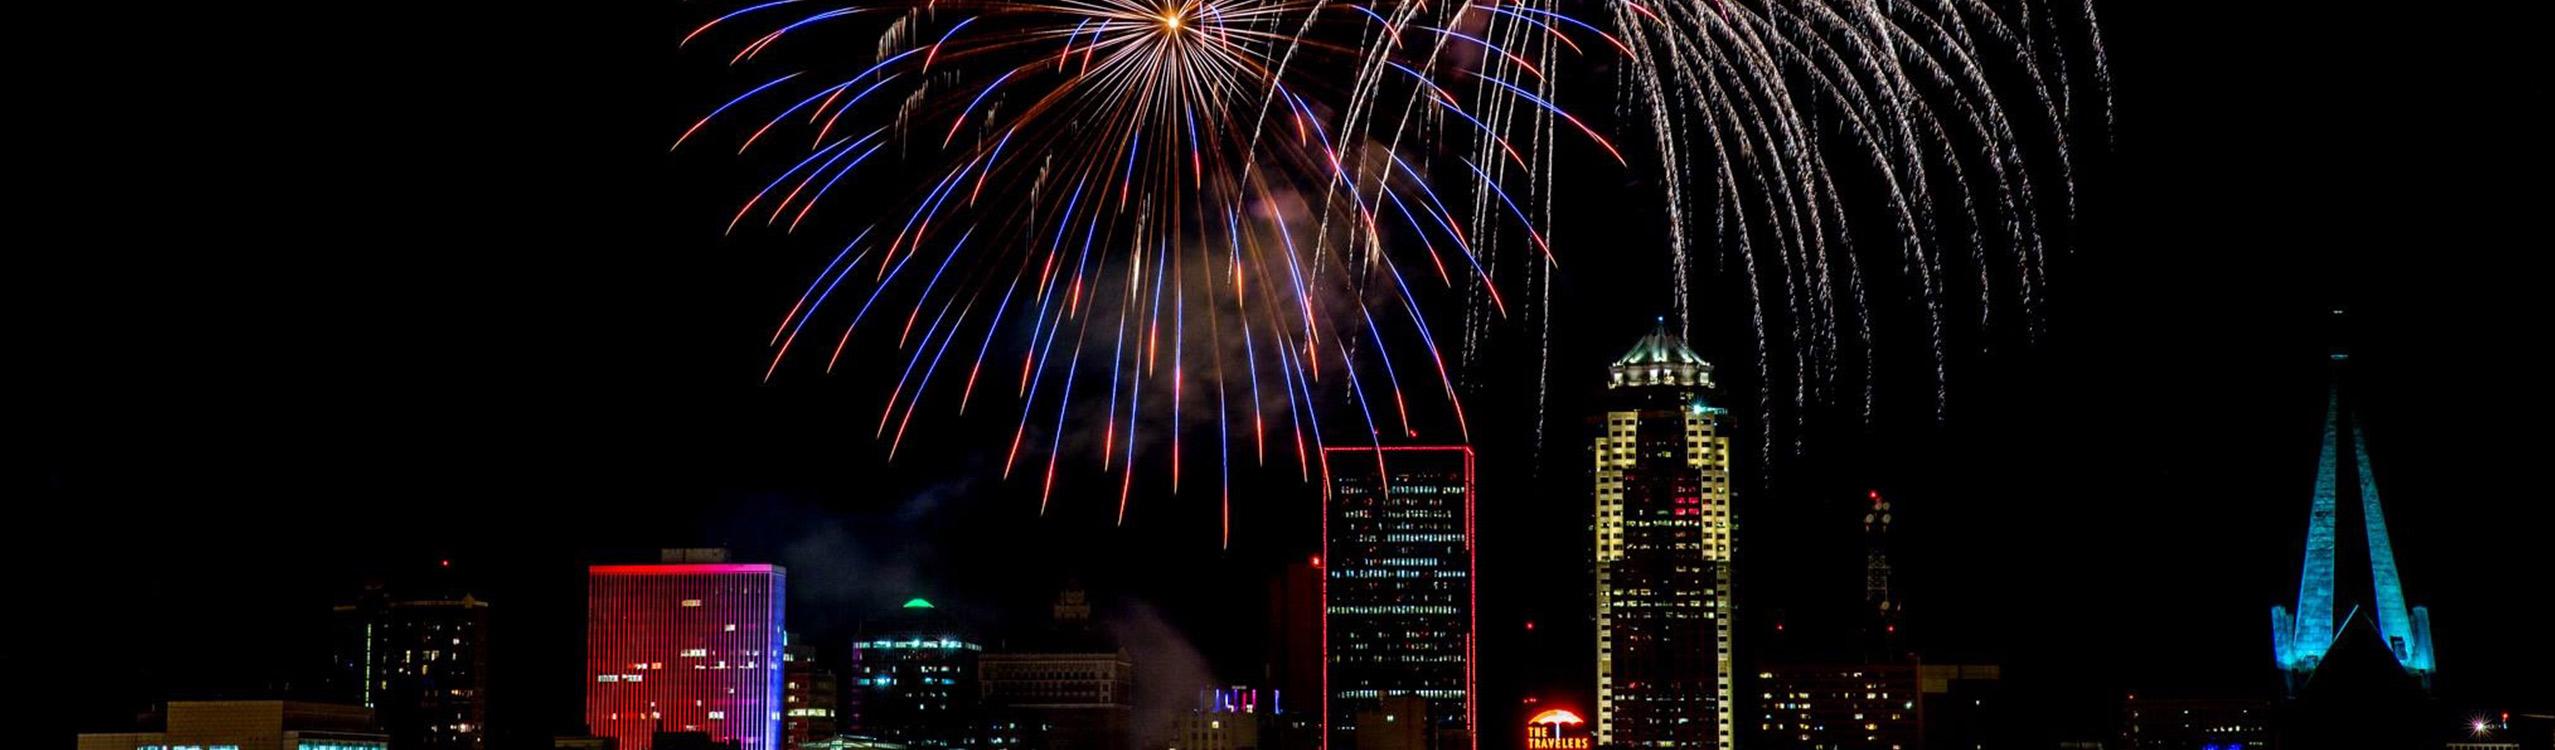 pyro fireworks